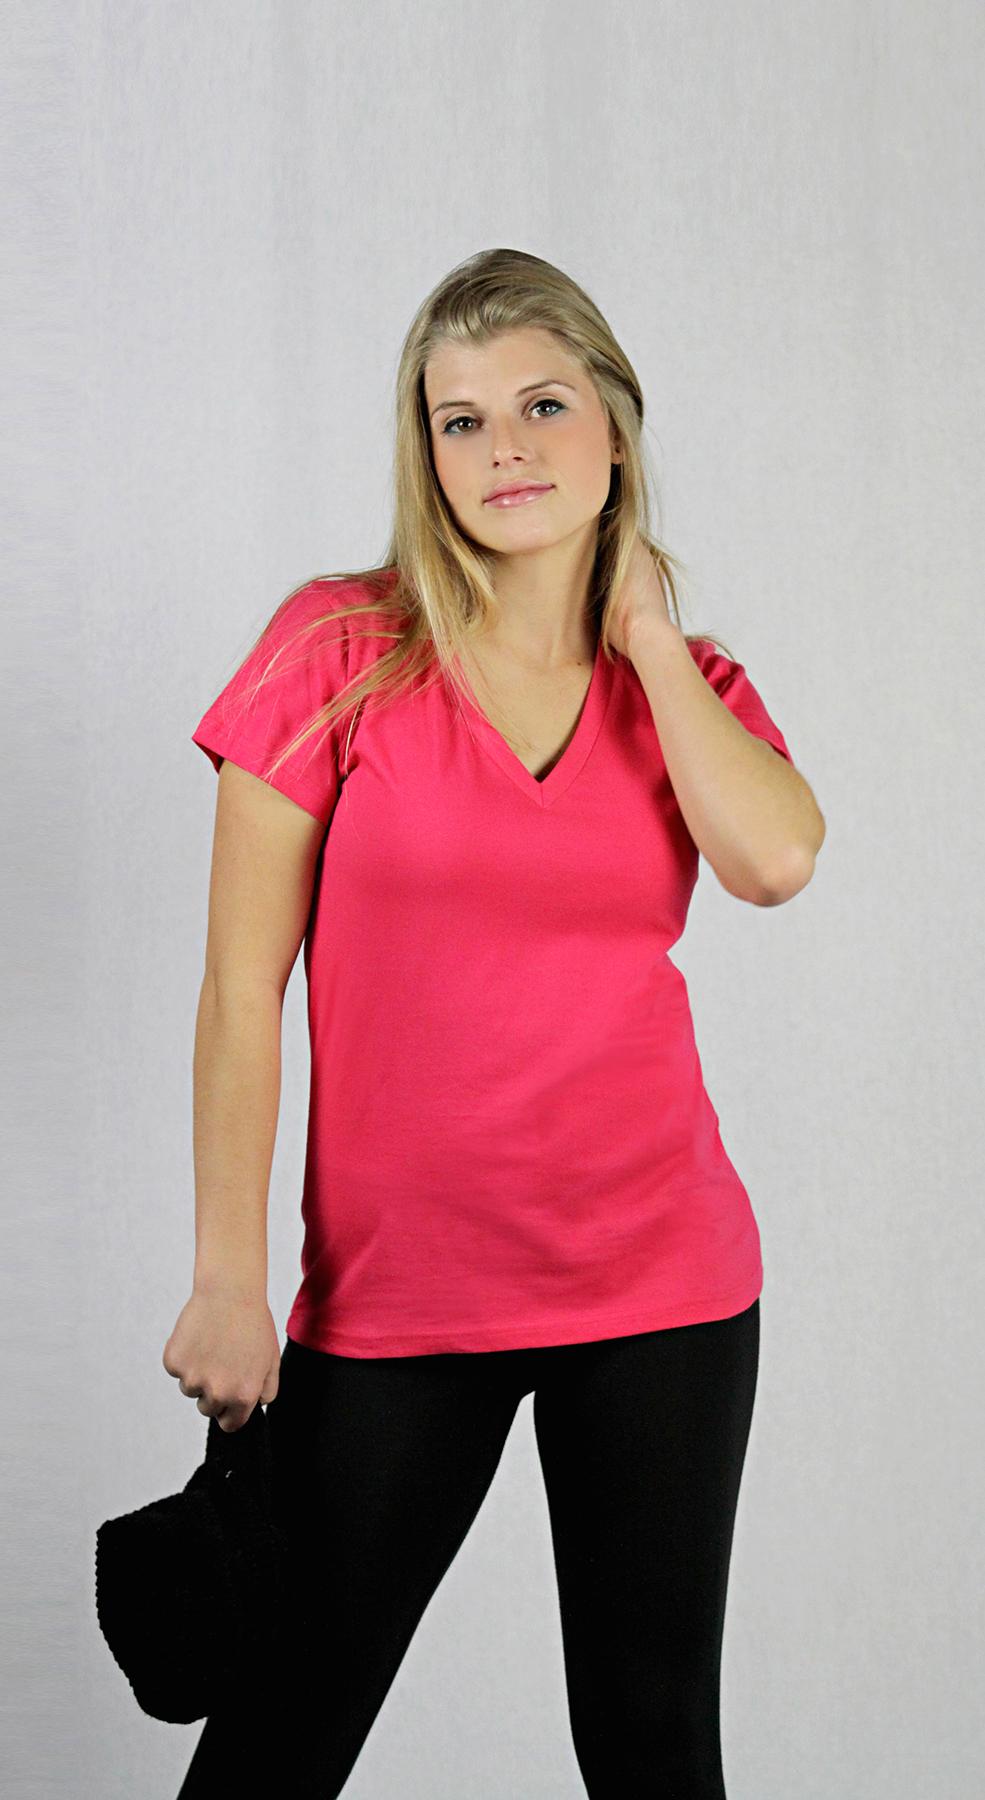 Monag 303016 - Short Sleeve V-Neck Tee